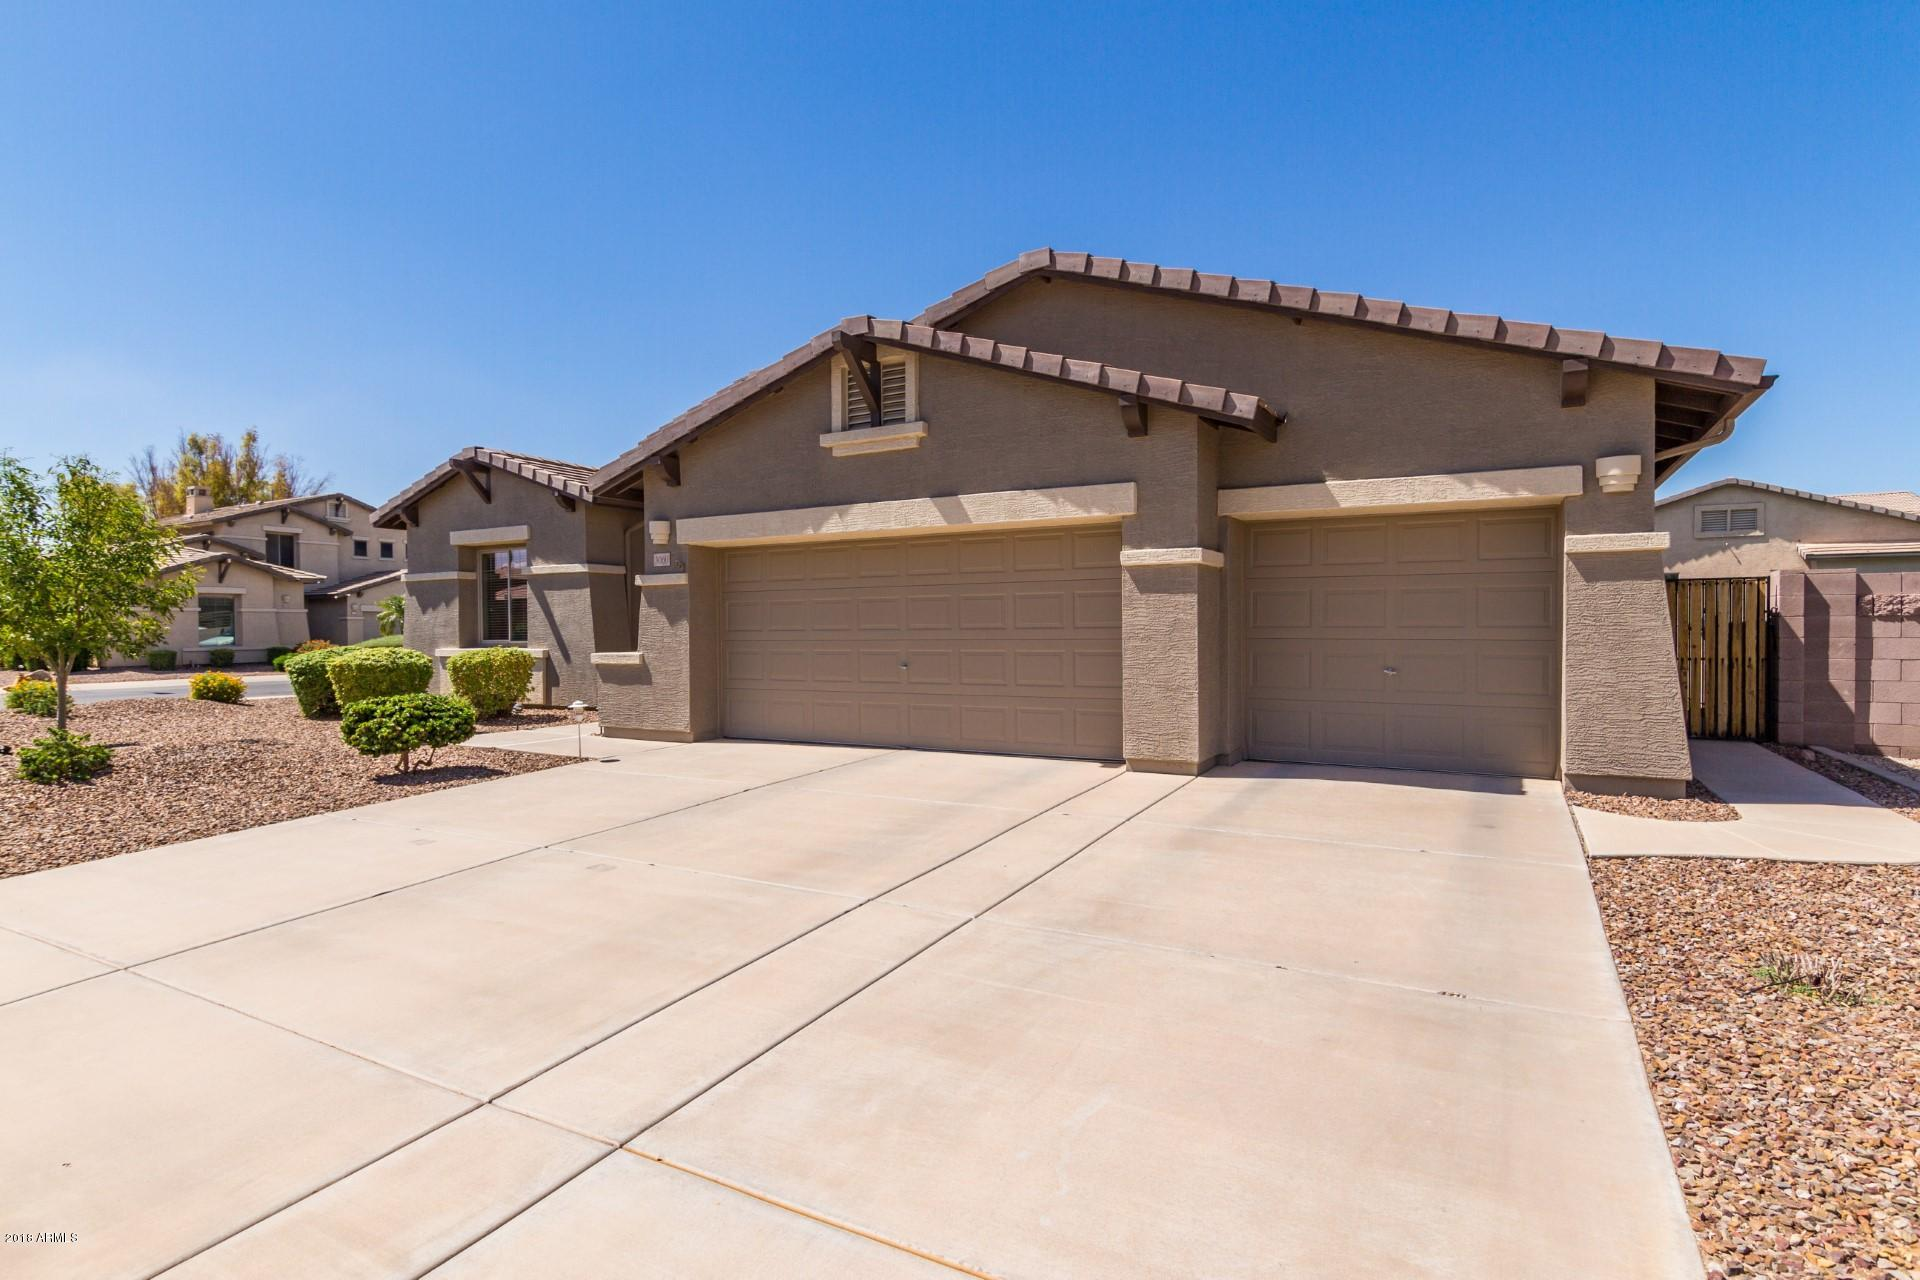 Photo for 3060 E Doral Drive, Chandler, AZ 85249 (MLS # 5816209)